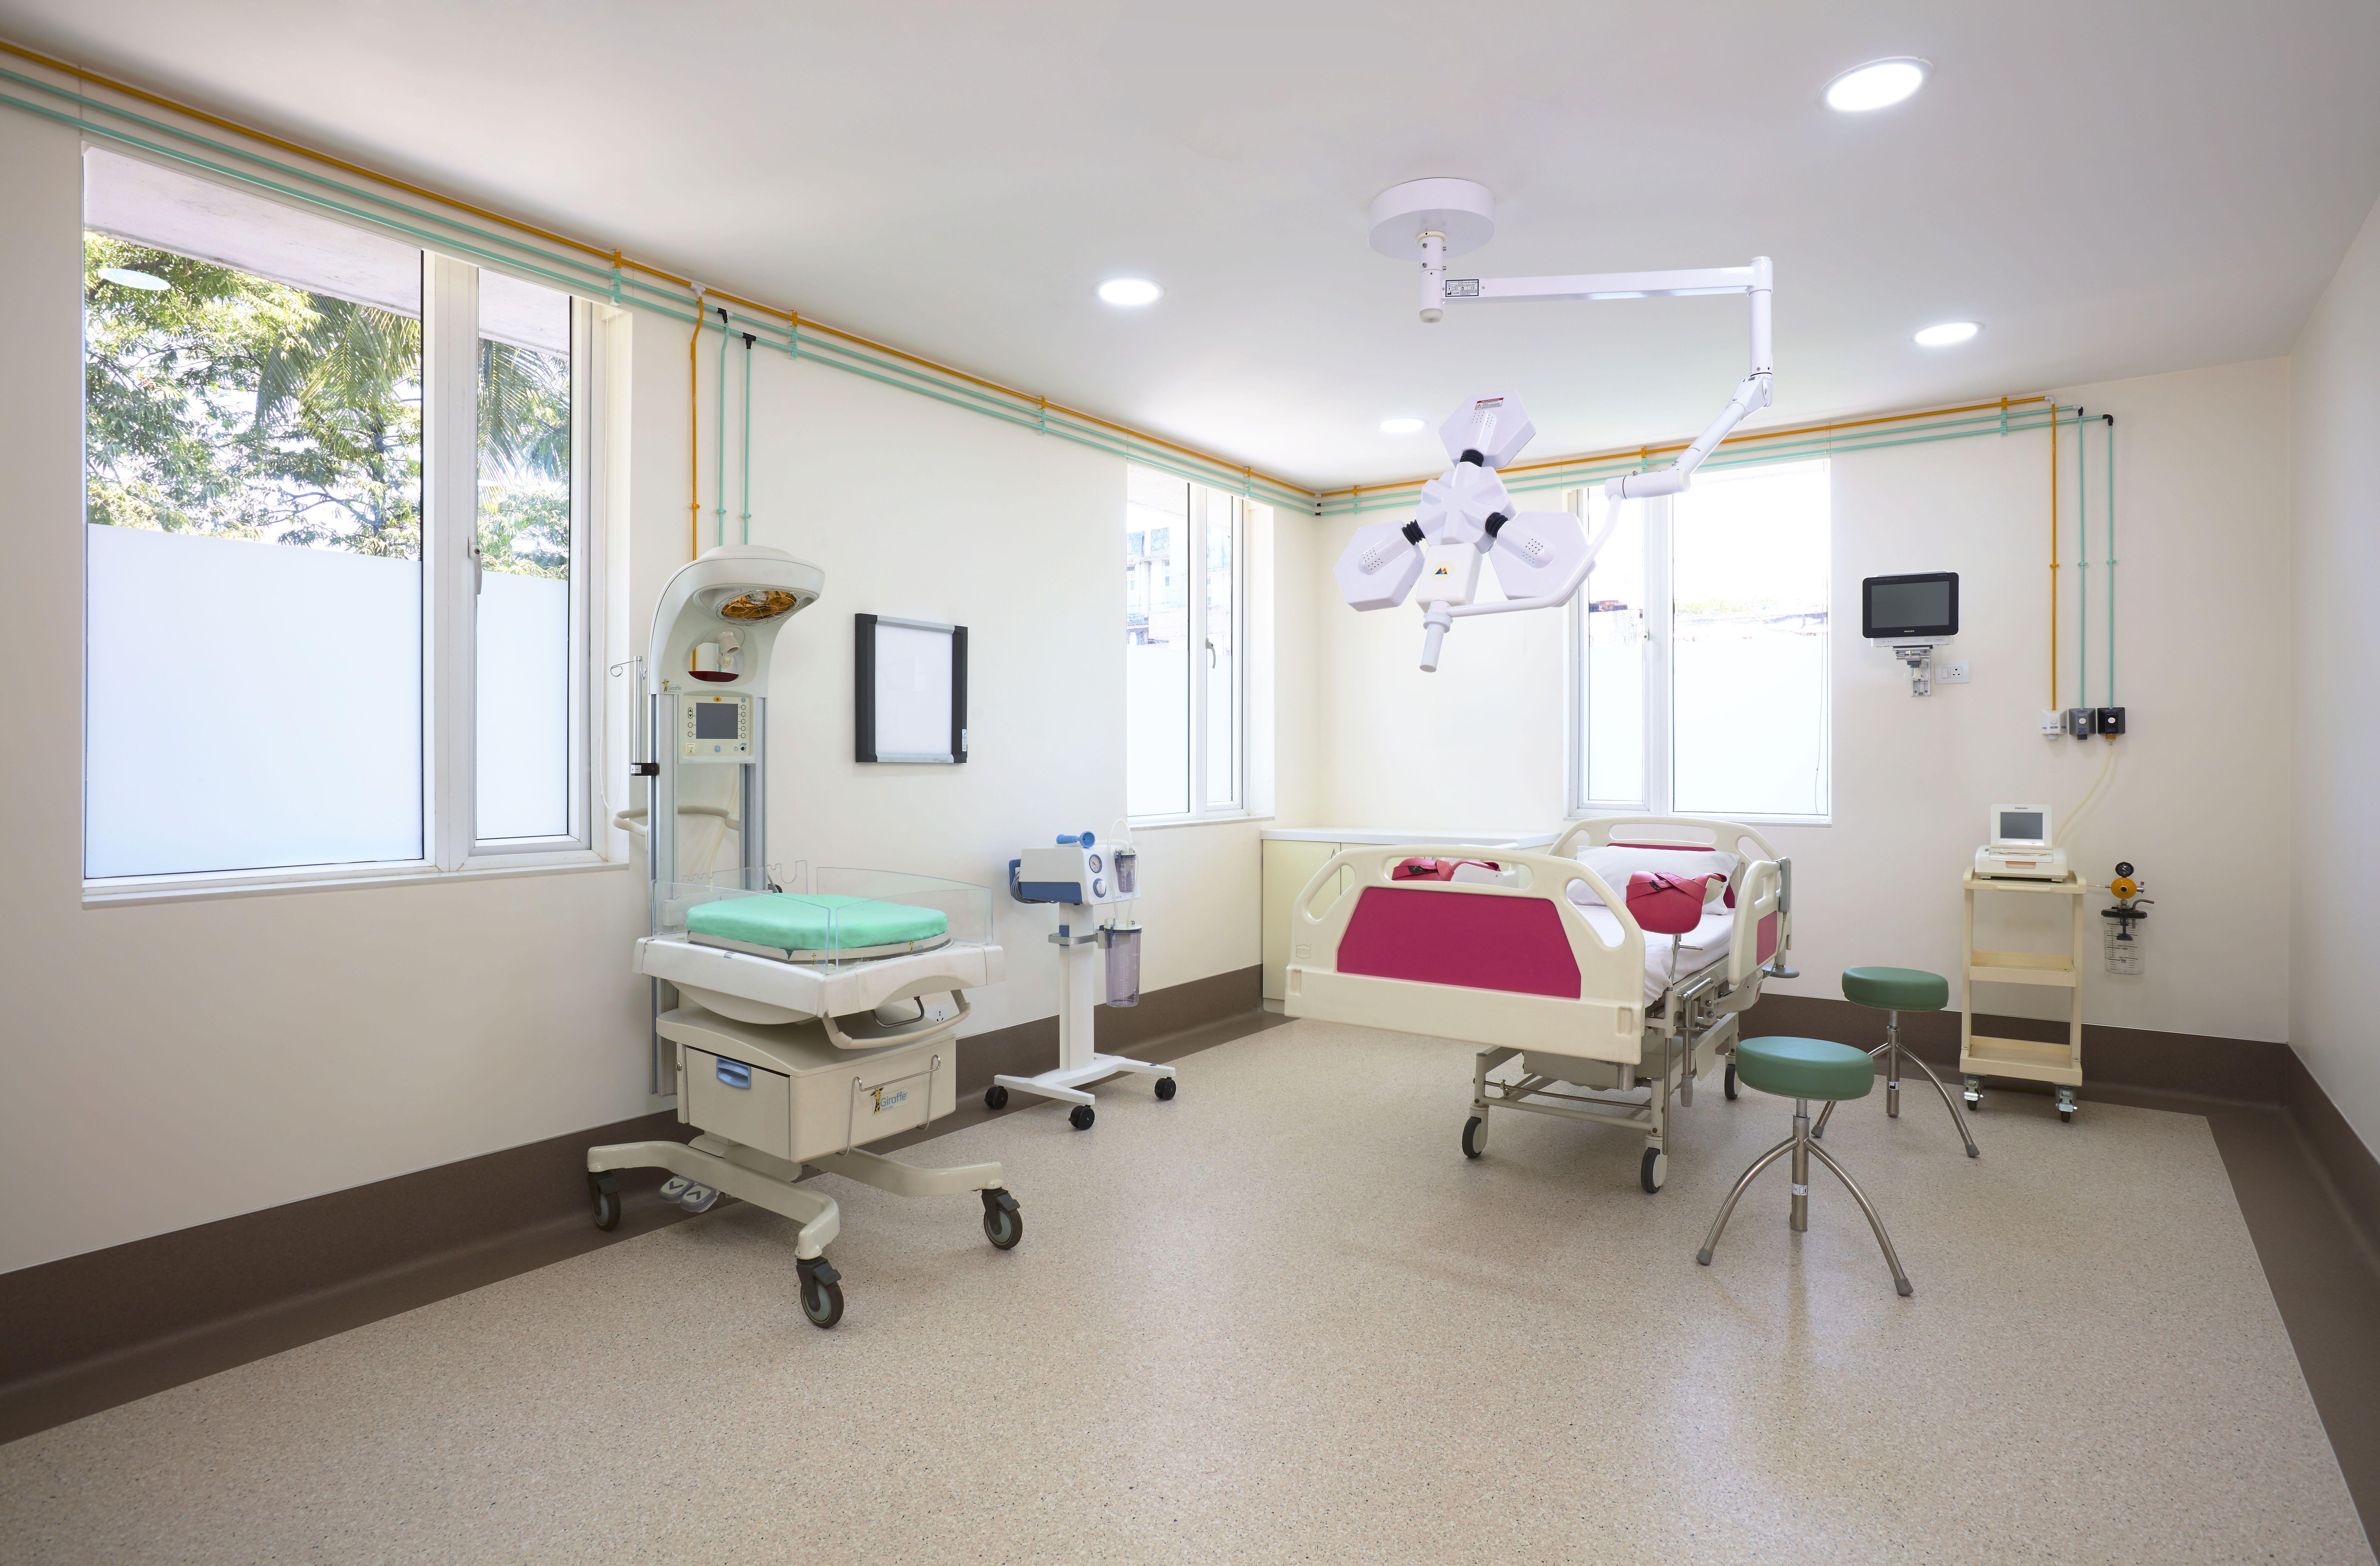 Birthing Centre Labour Room Hospital Interior Design Healthcare Interior Design Hospital Interior